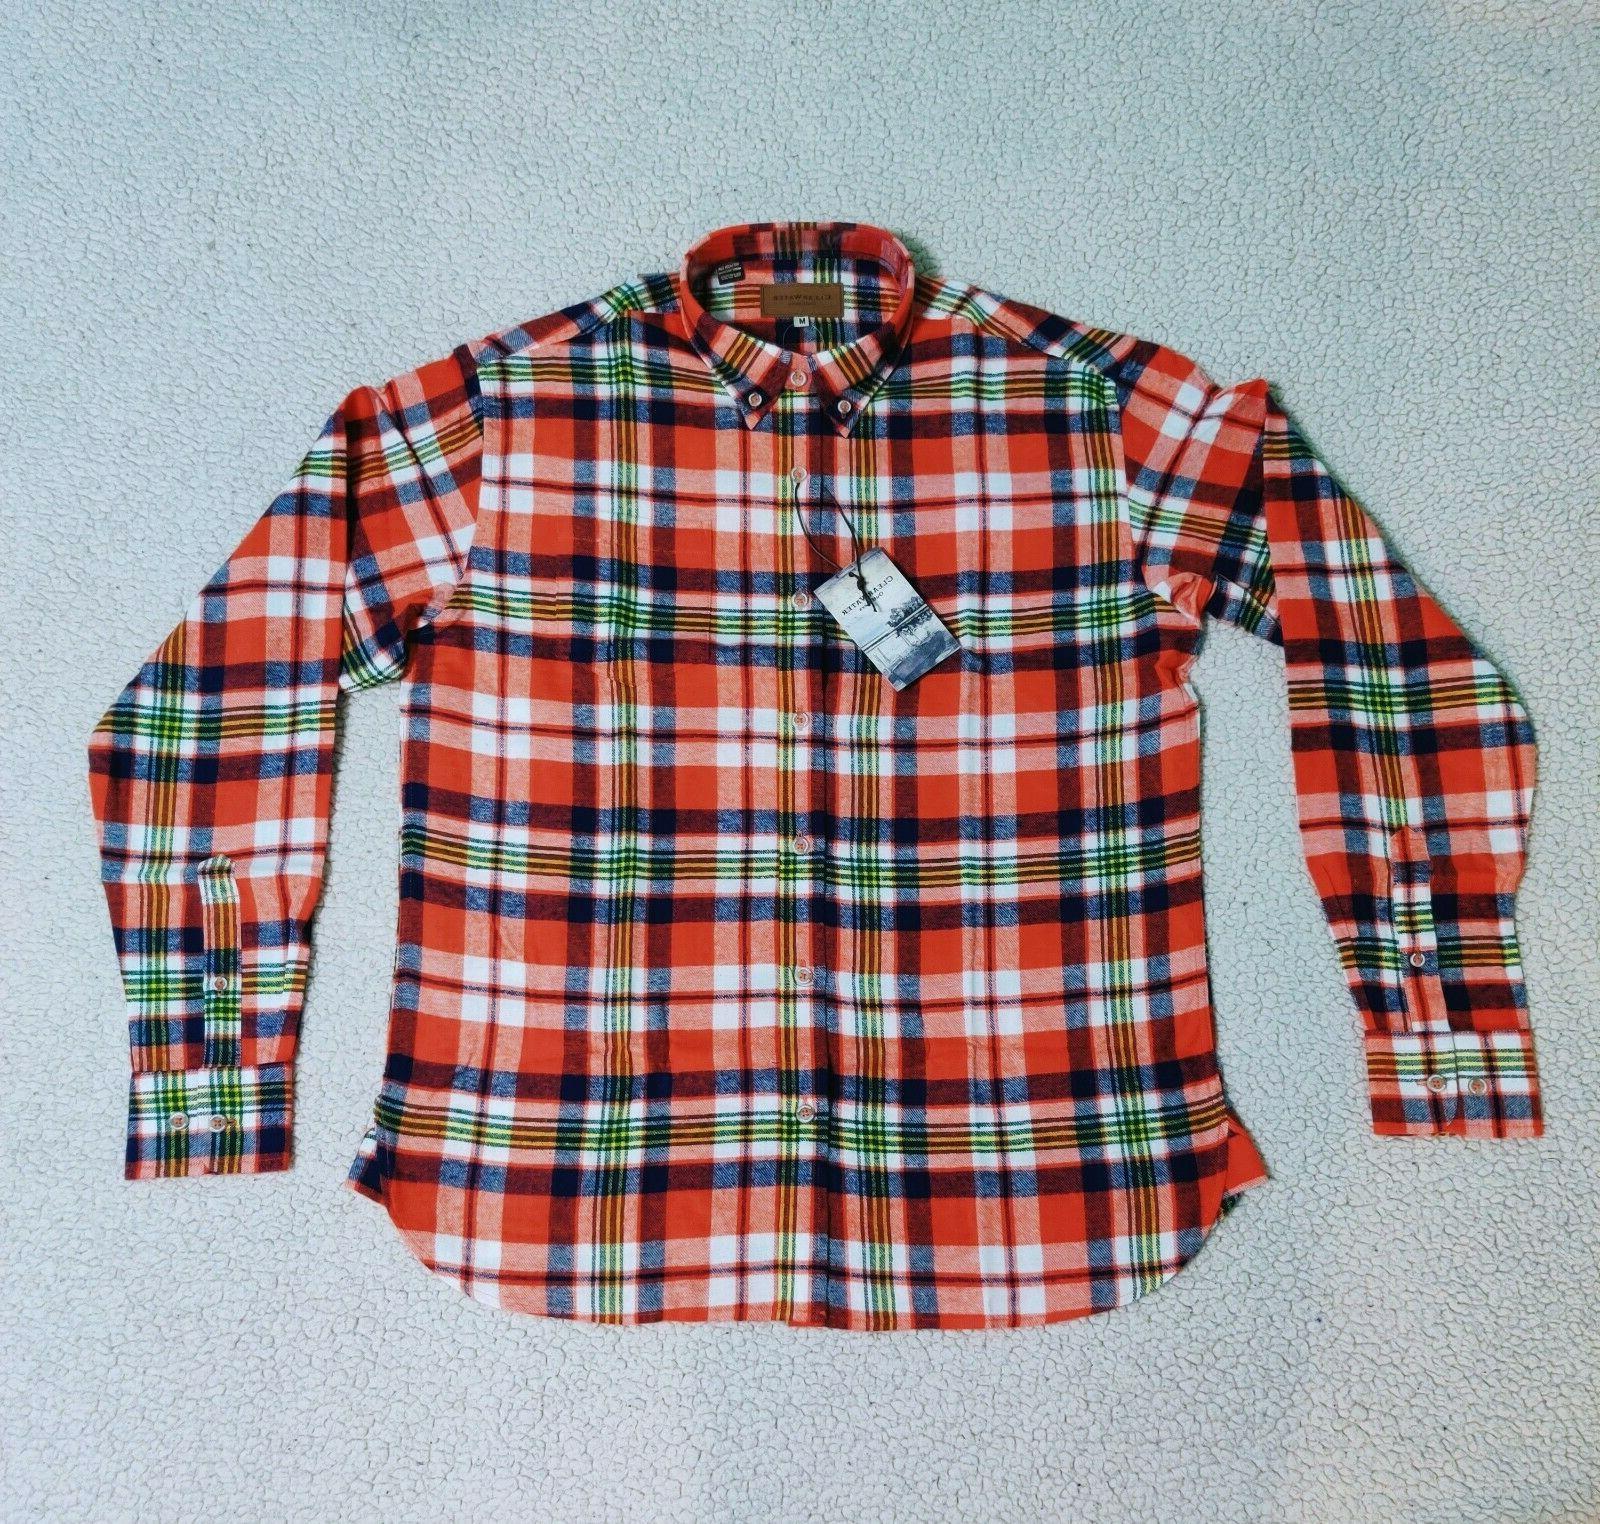 Mens Soft Flannel Long Up Shirts | Men's M XL 2XL